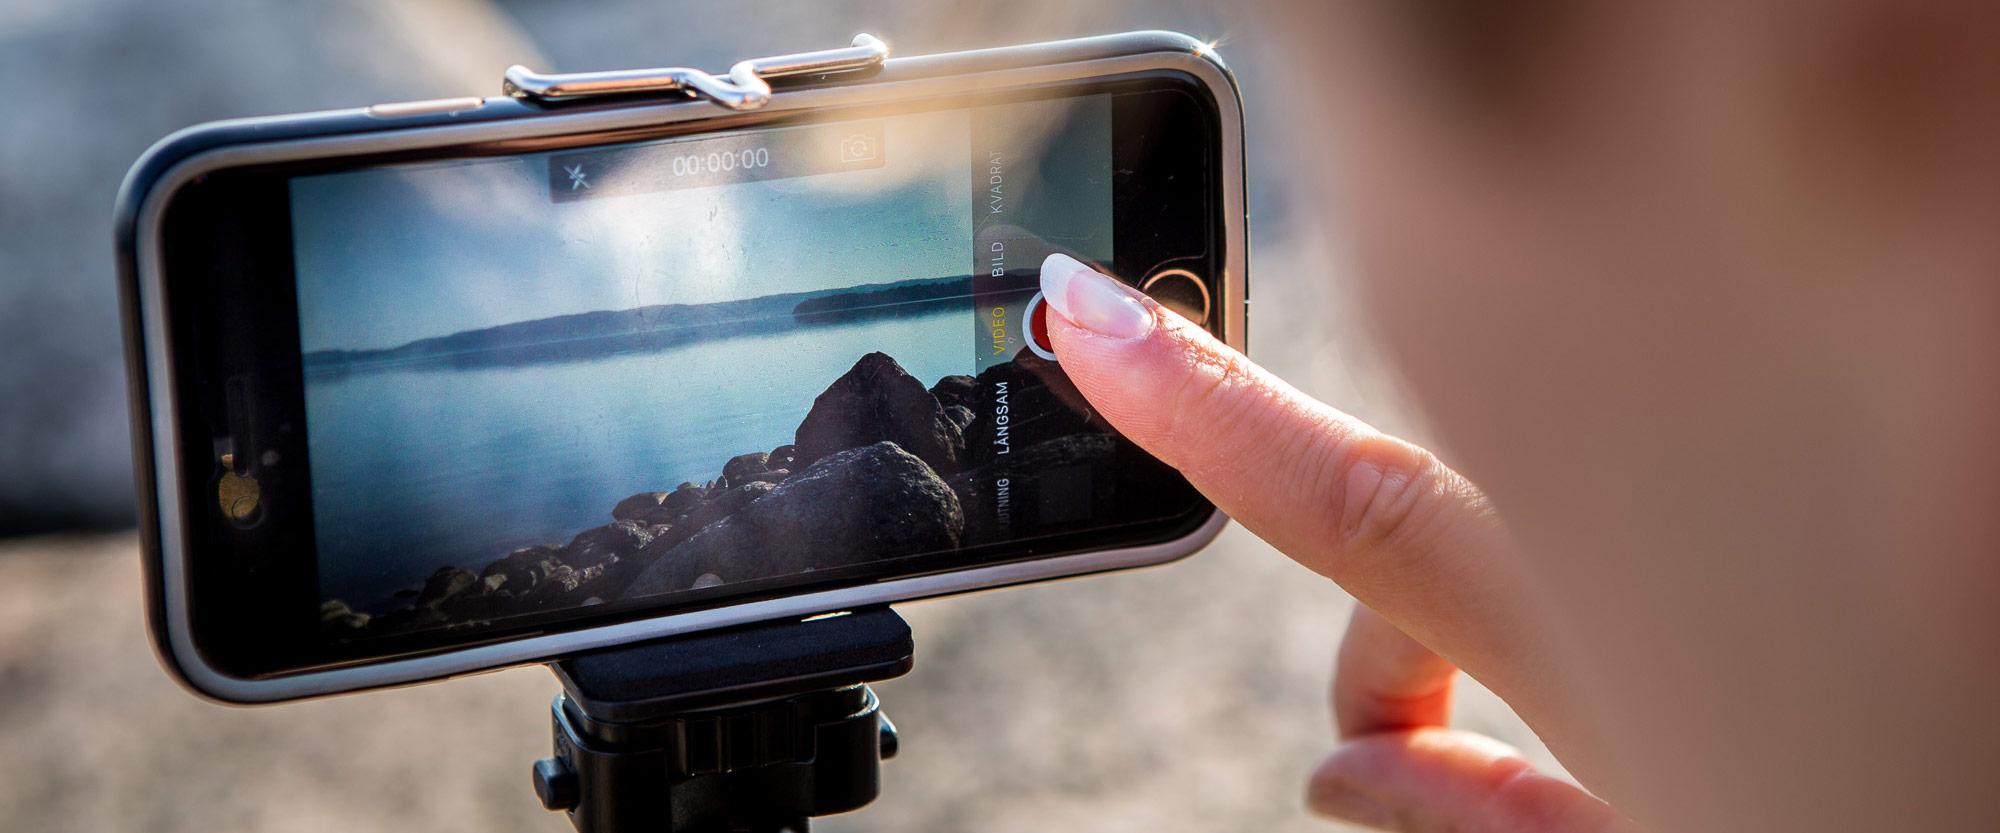 Onlinekurs Filma med mobilen (2021)